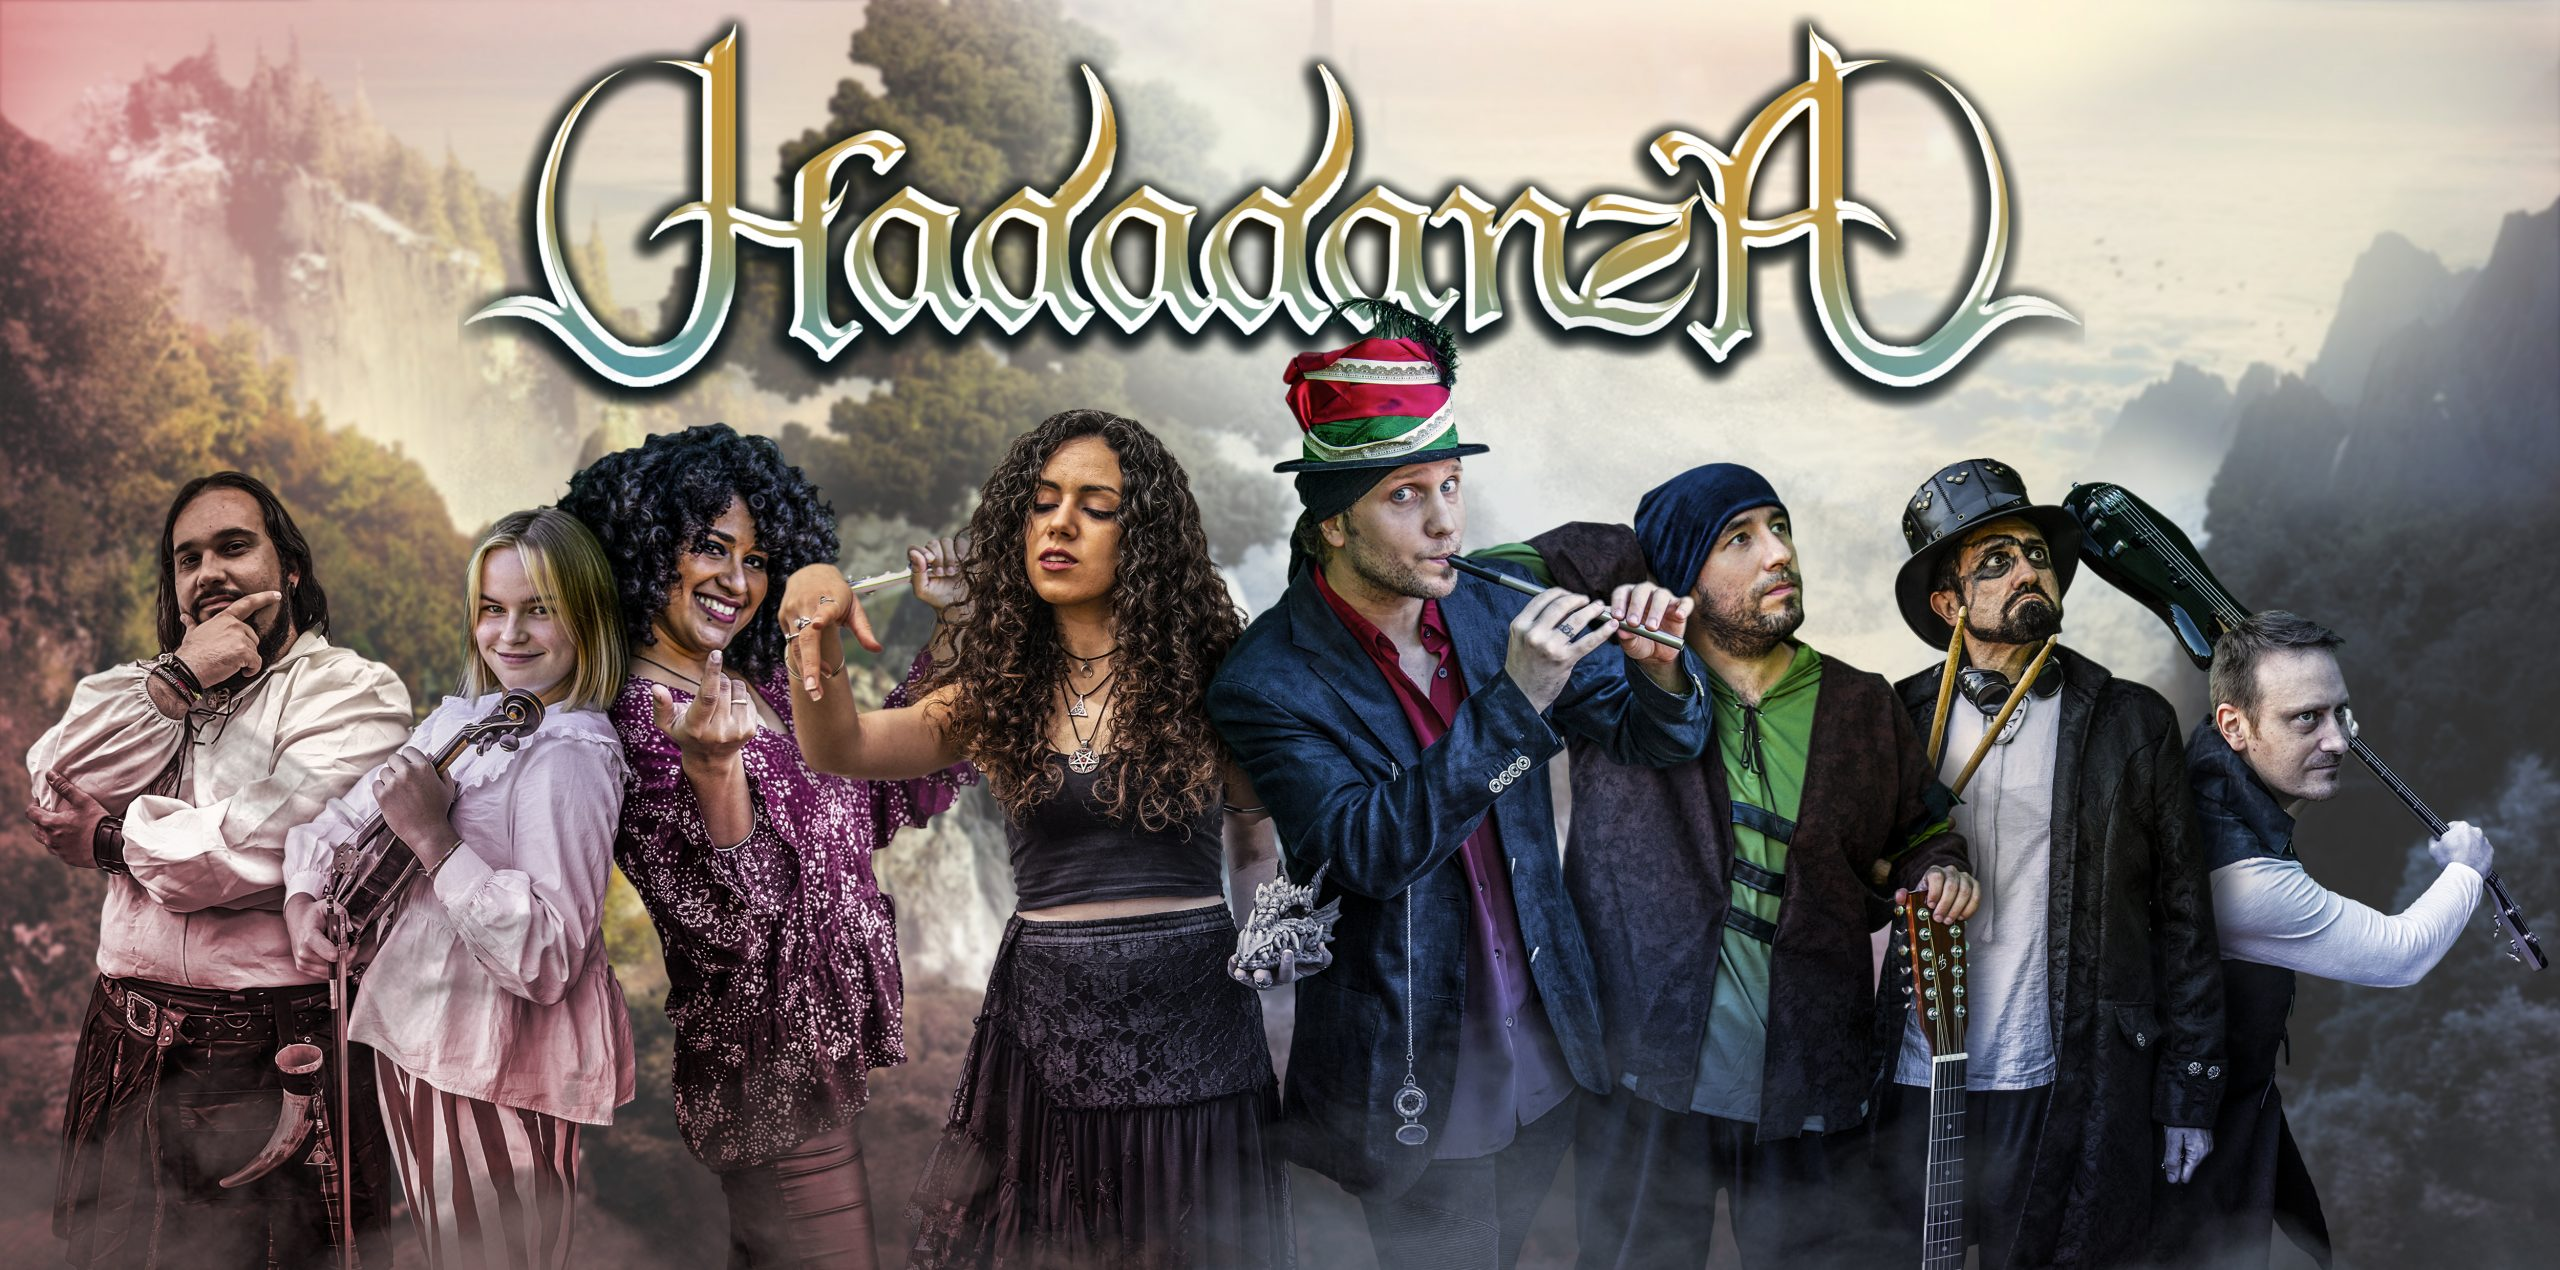 FOLK METAL ROCK - ¡HADADANZA!